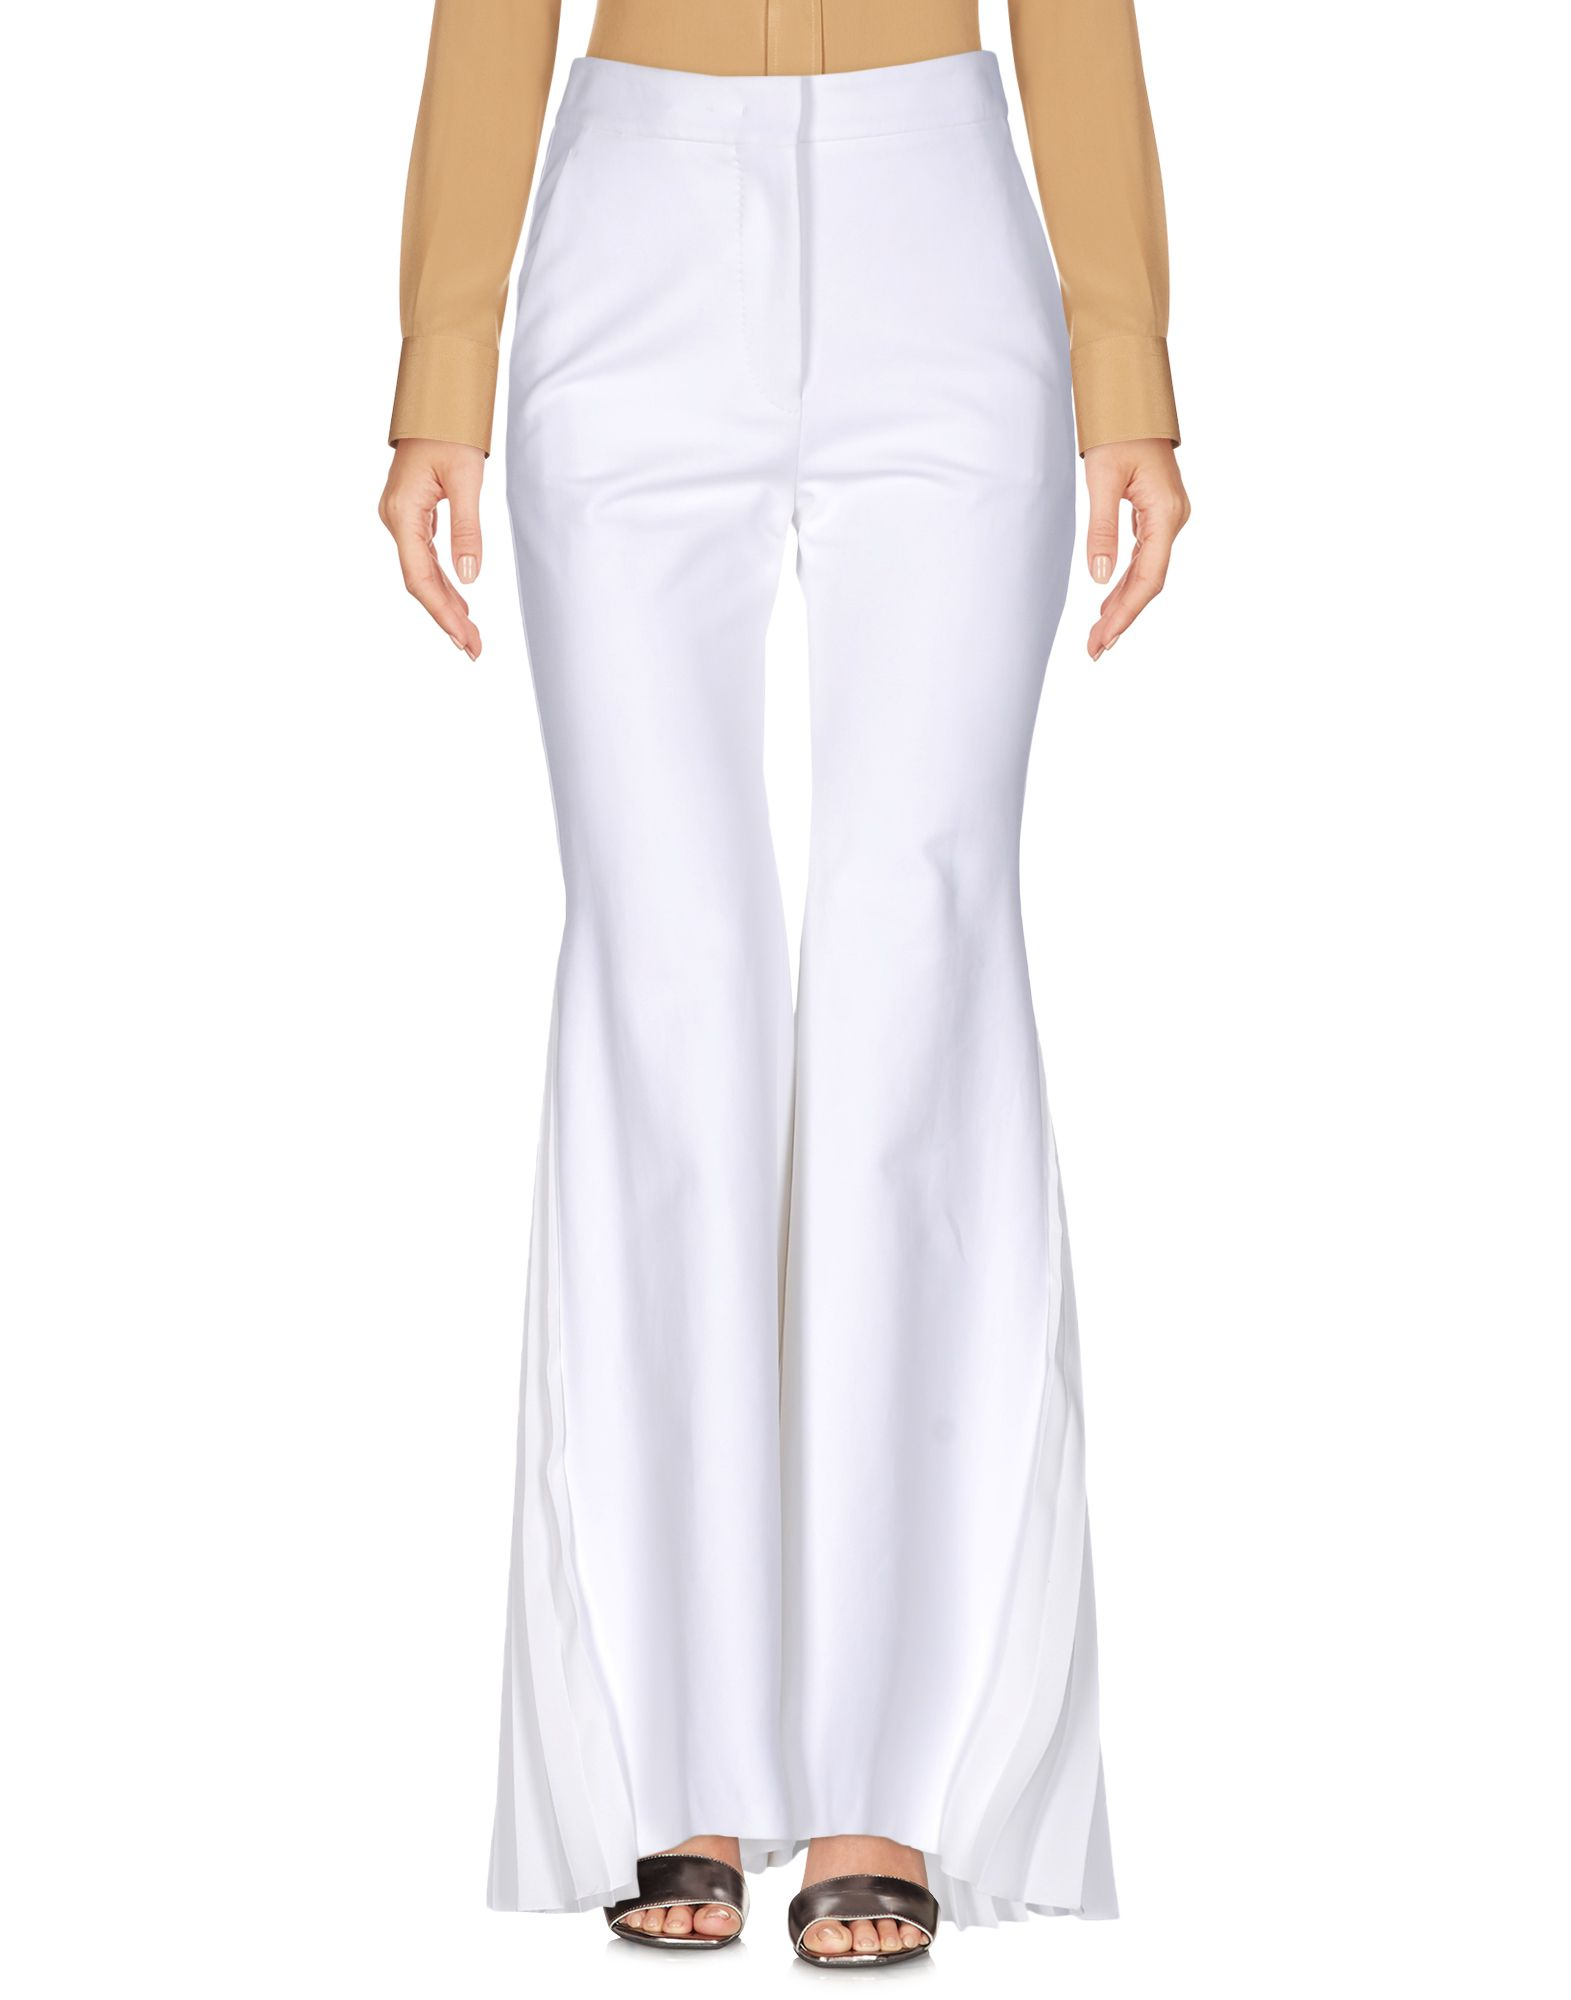 Pantalone Sara Battaglia Donna - Acquista online su XSDV4HFdeq